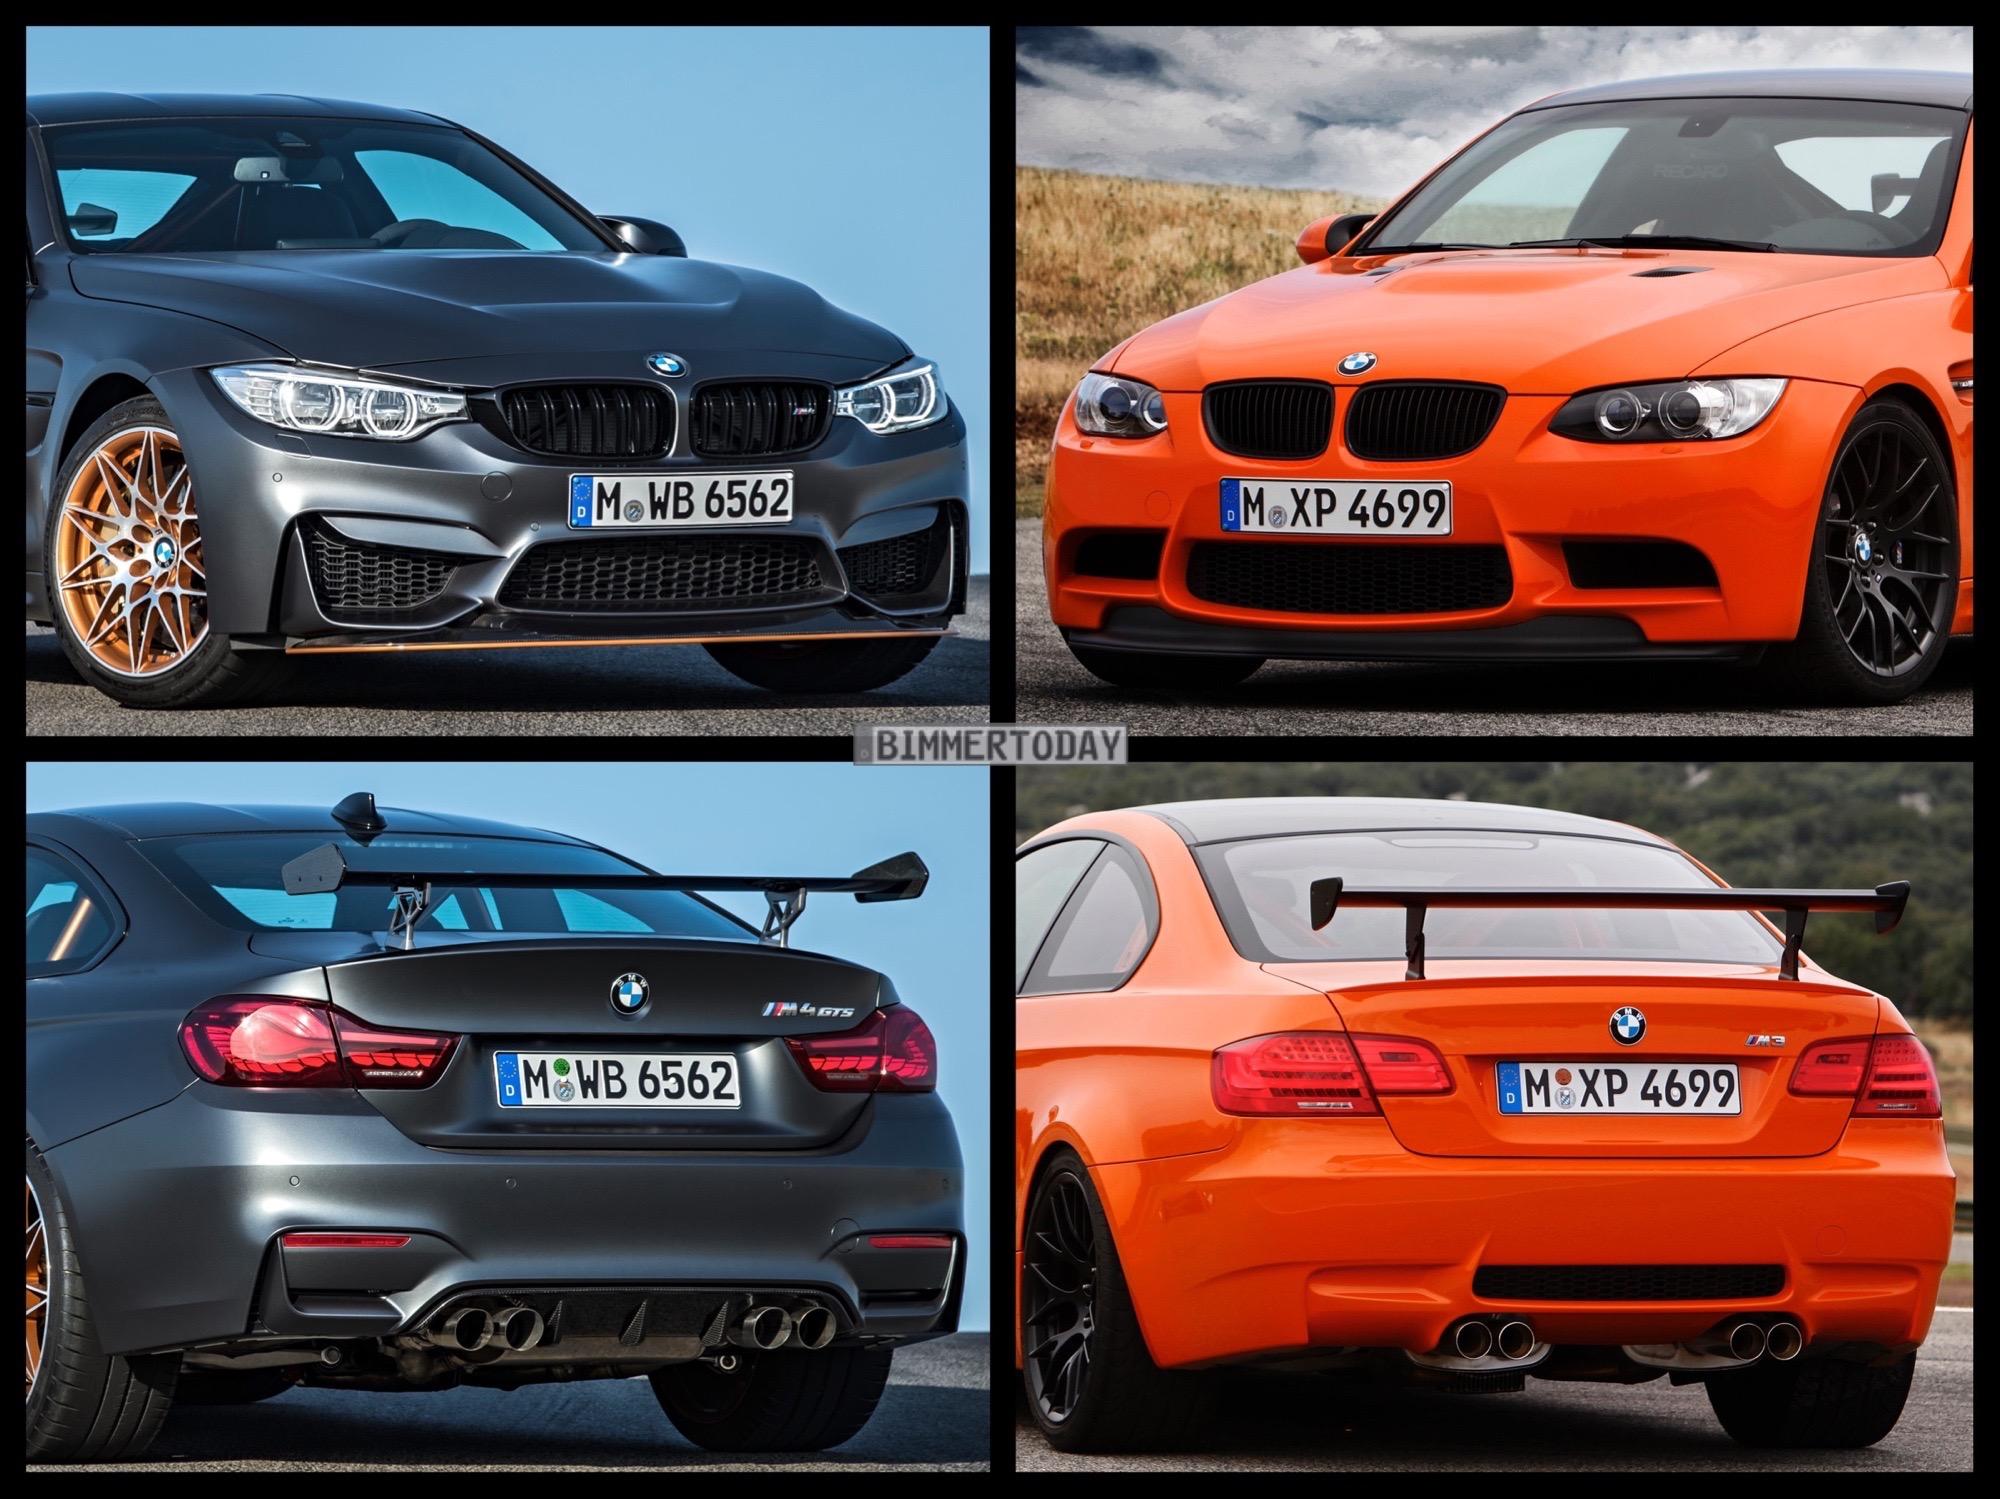 Bmw M4 Gts Vs Bmw M3 Gts Photo Comparison